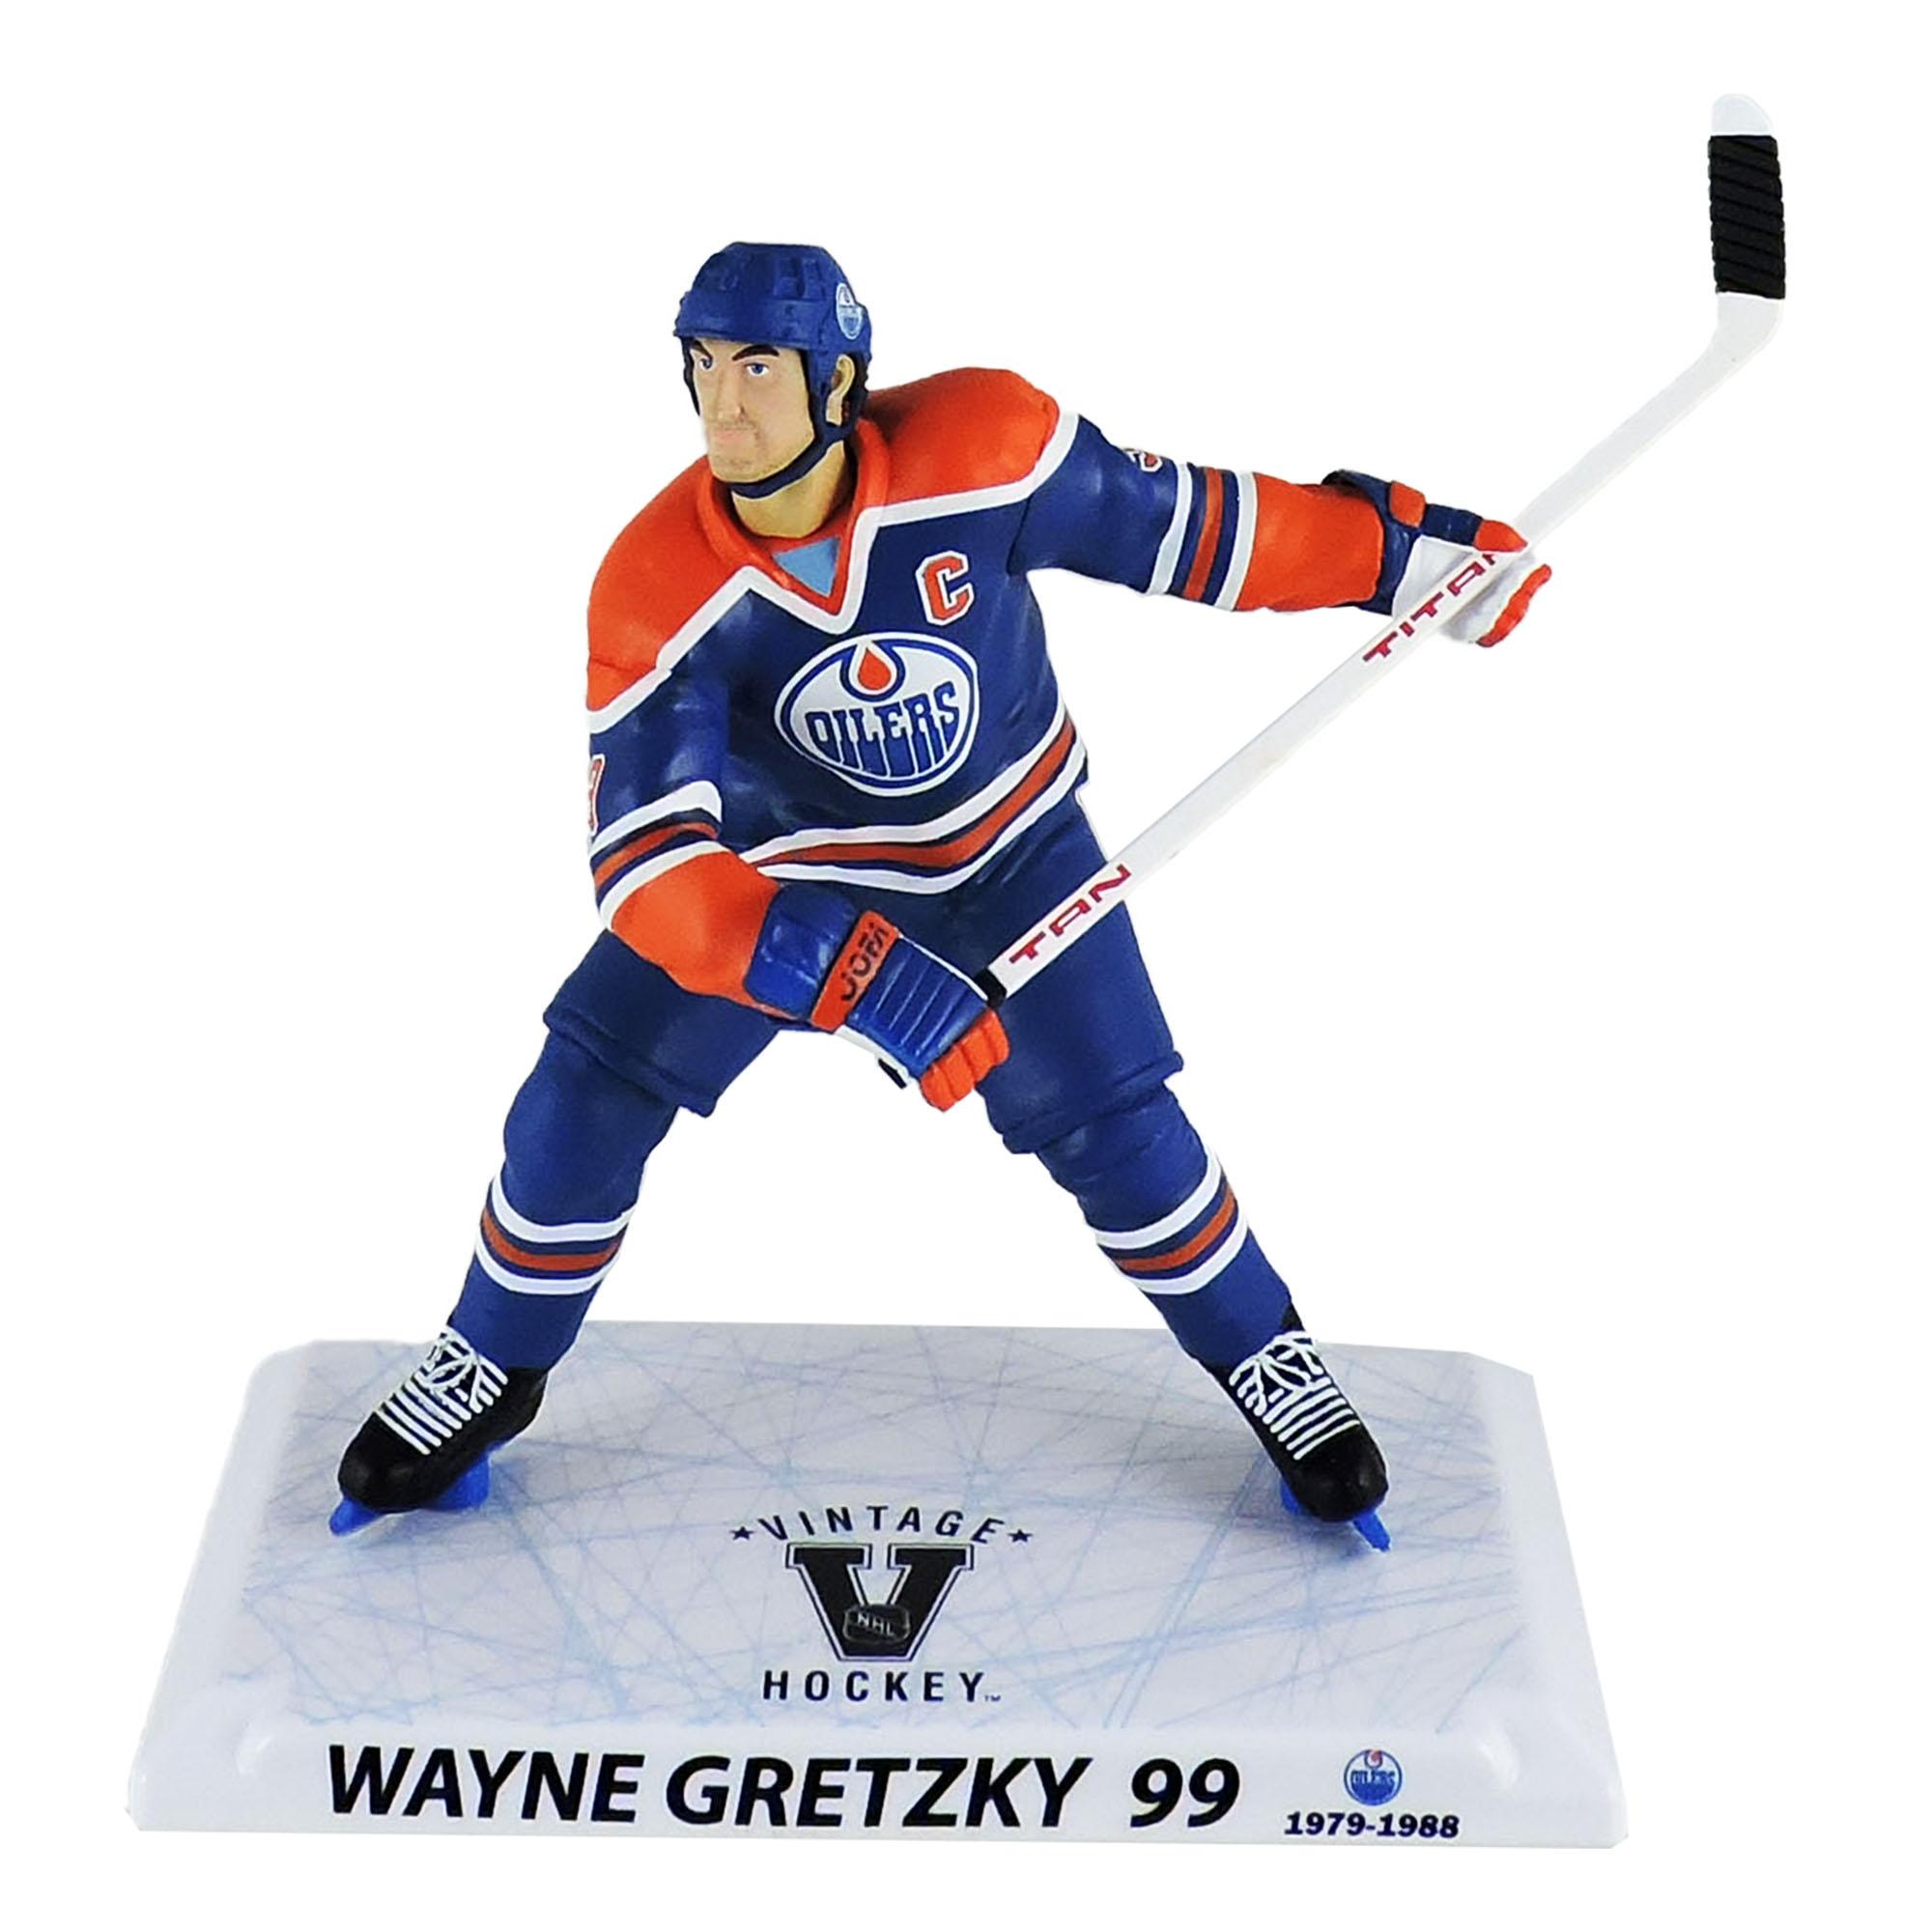 "Wayne Gretzky Edmonton Oilers Imports Dragon 6"" Player Replica Figurine - No Size"